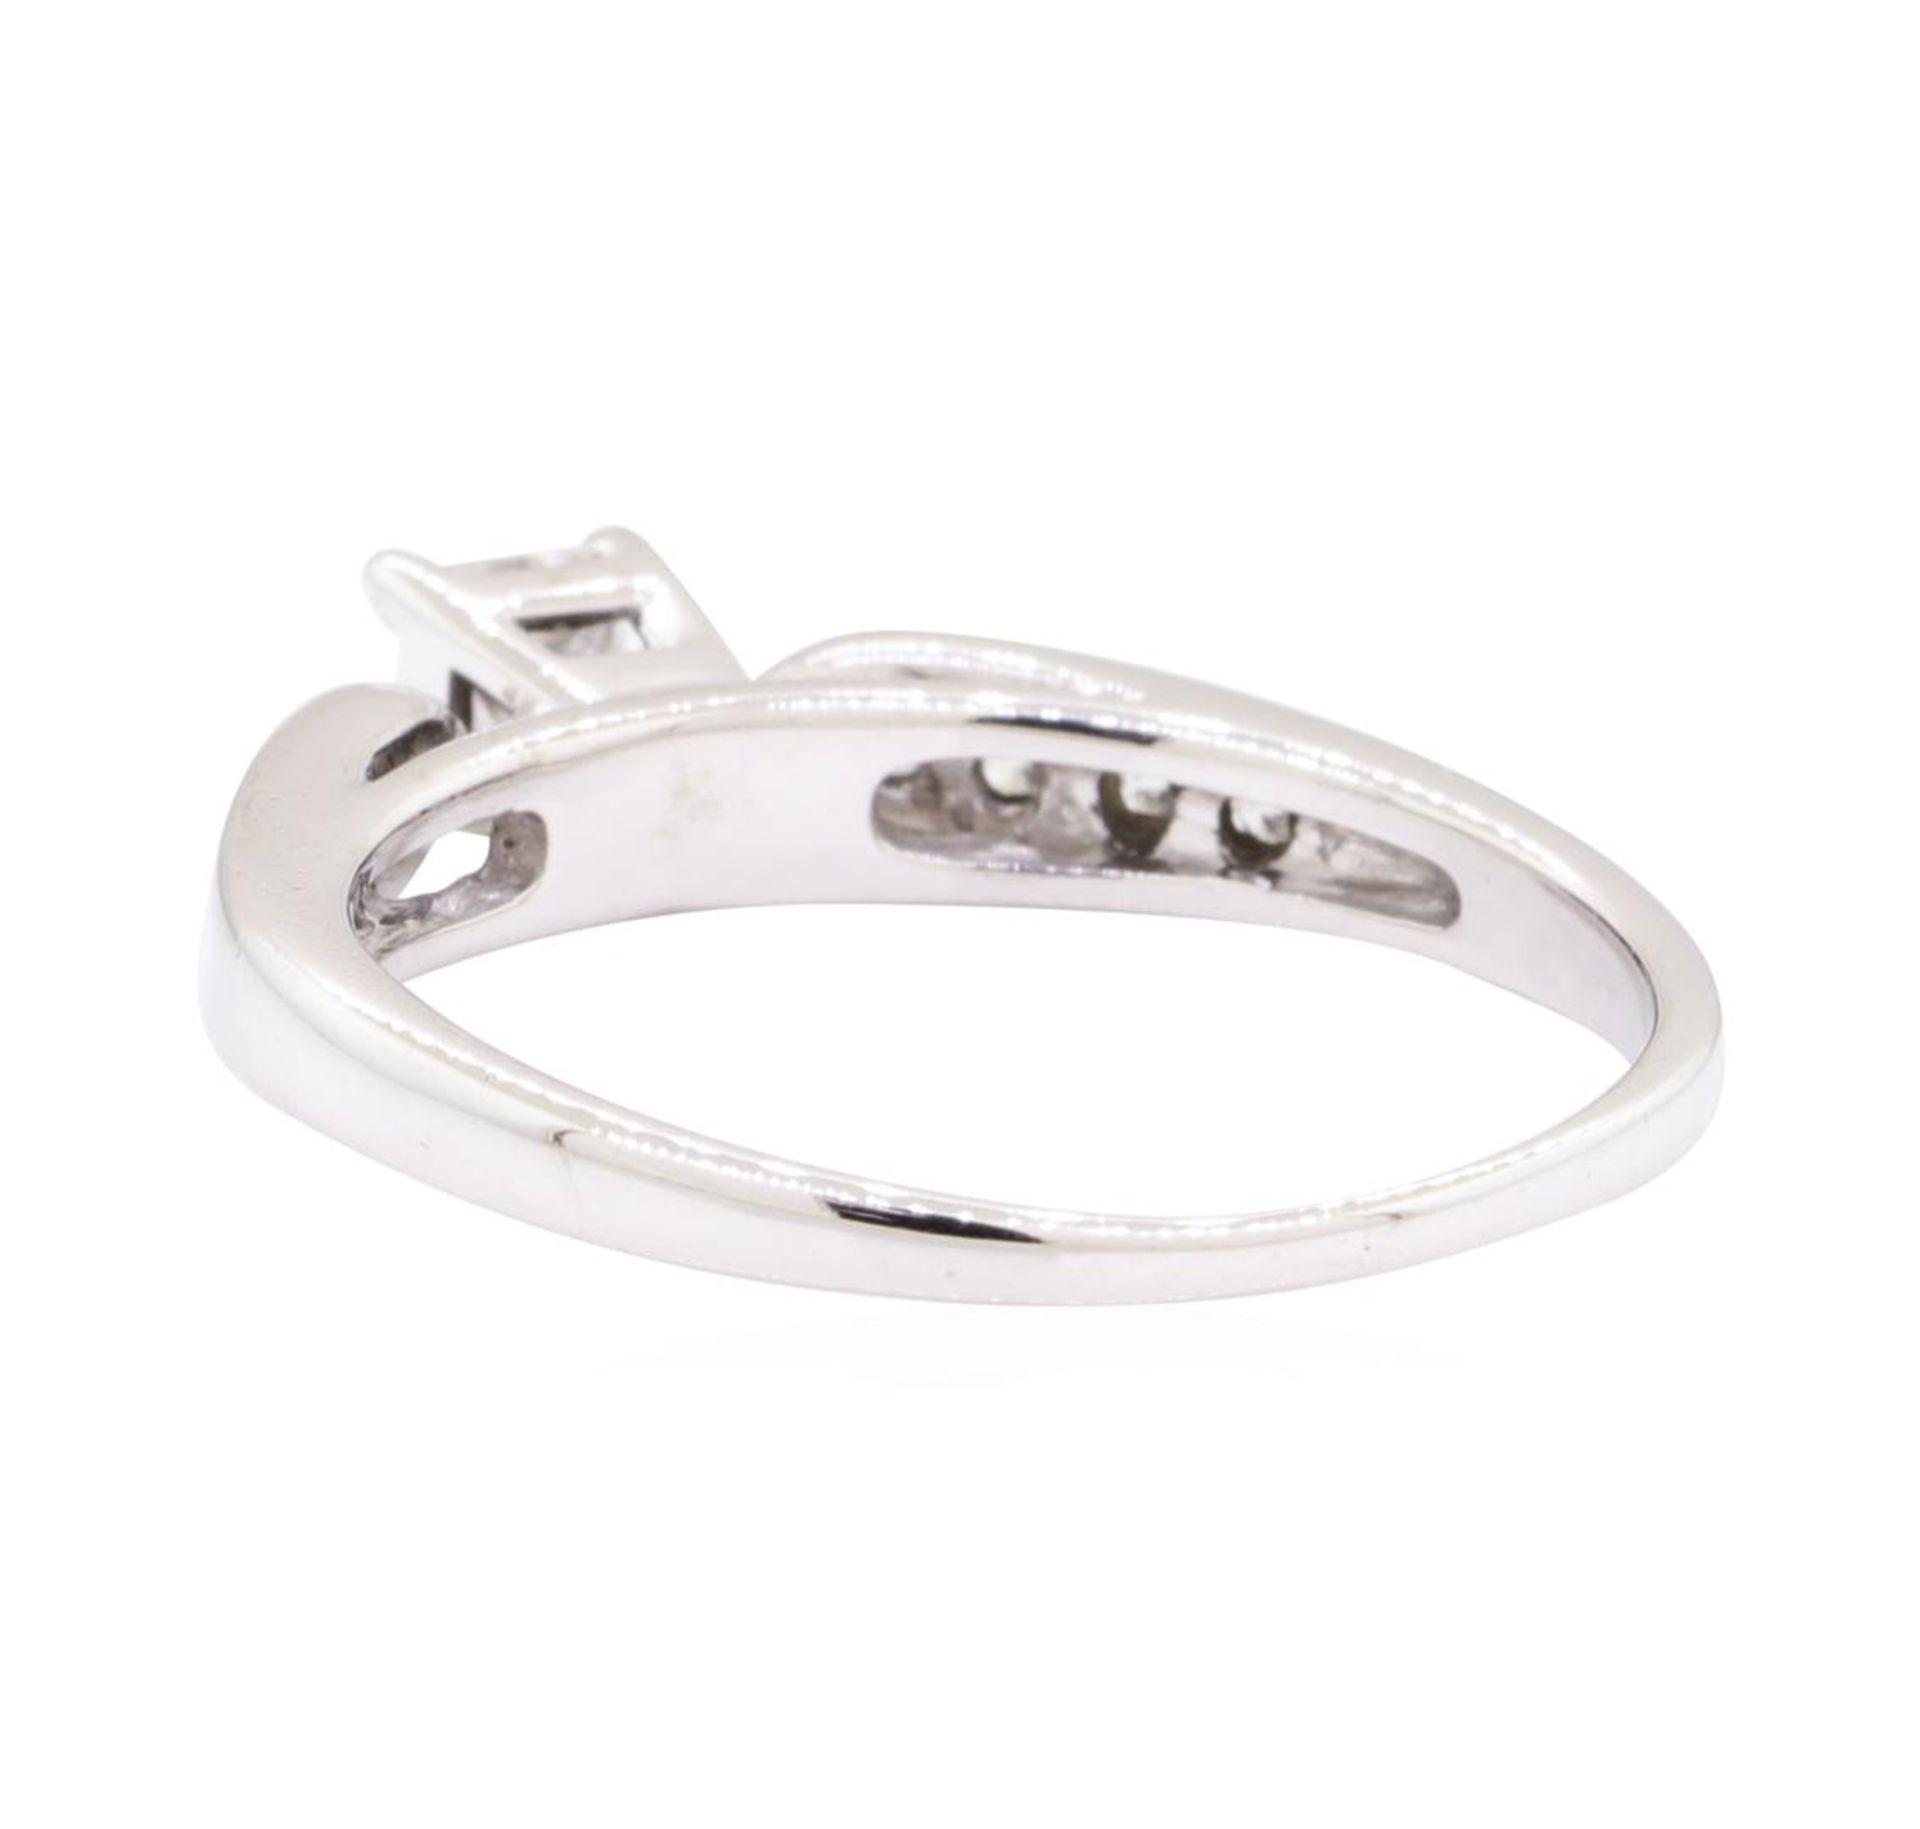 0.70 ctw Diamond Ring - 14KT White Gold - Image 3 of 4